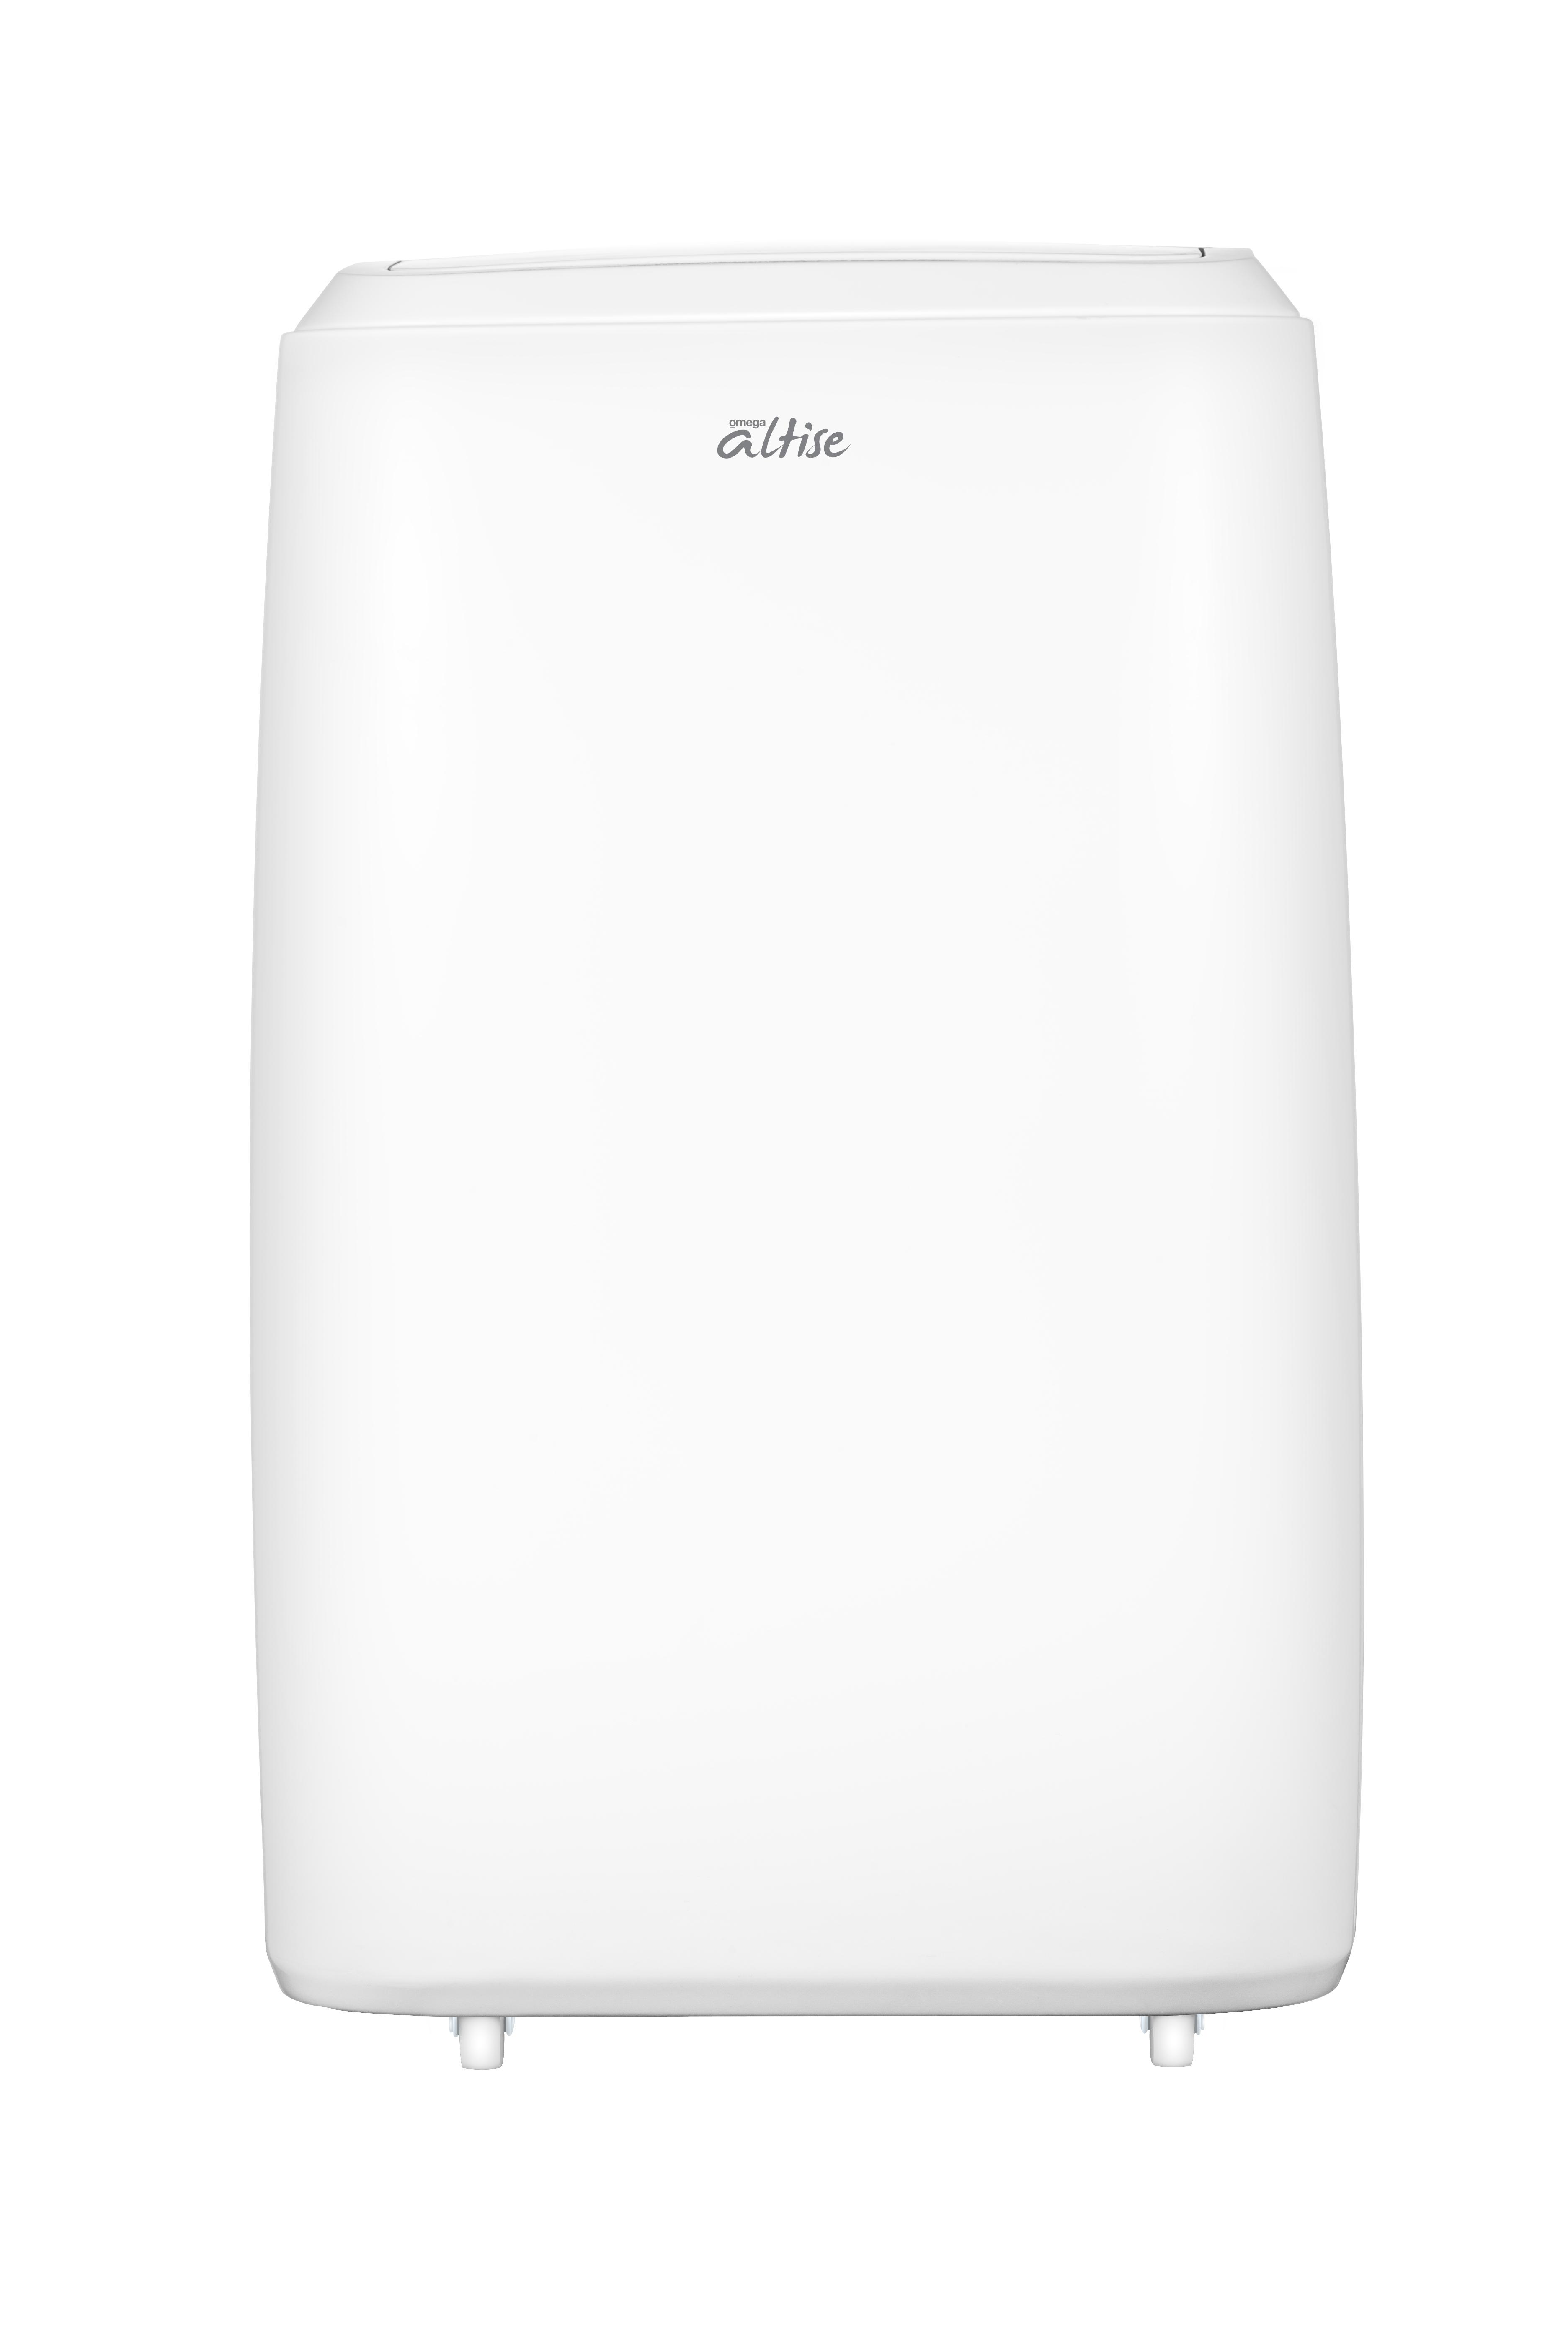 Omega Altise product 3.5kW Slimline Portable Air-ConditionerOAPC127